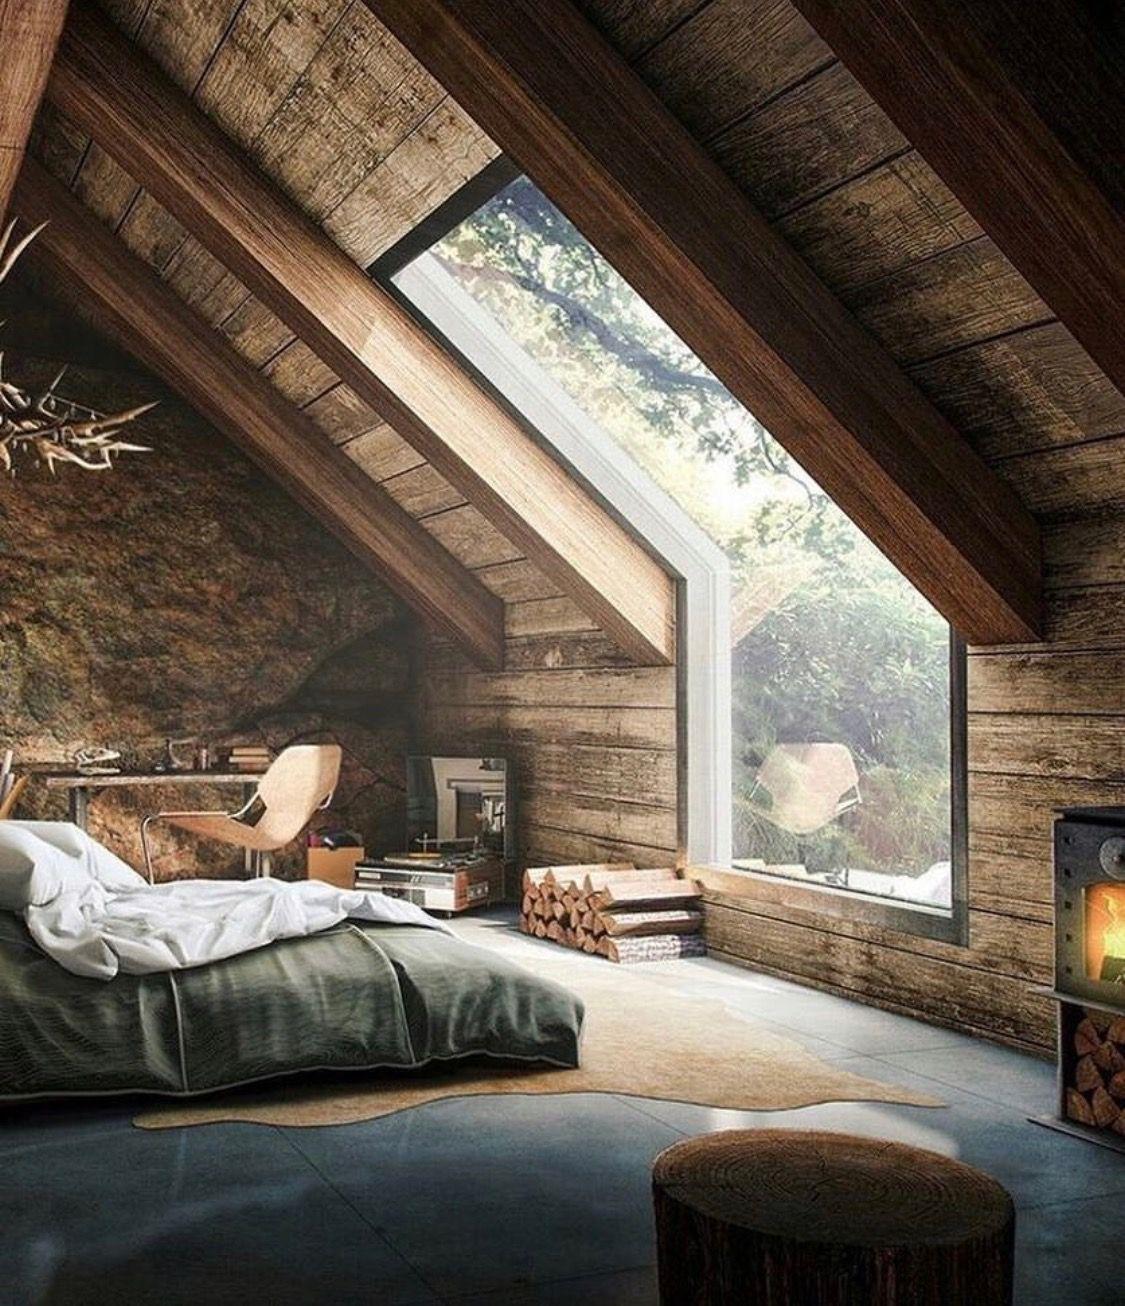 the best of interior decor in interior decor luxury style ideas home decor ideas